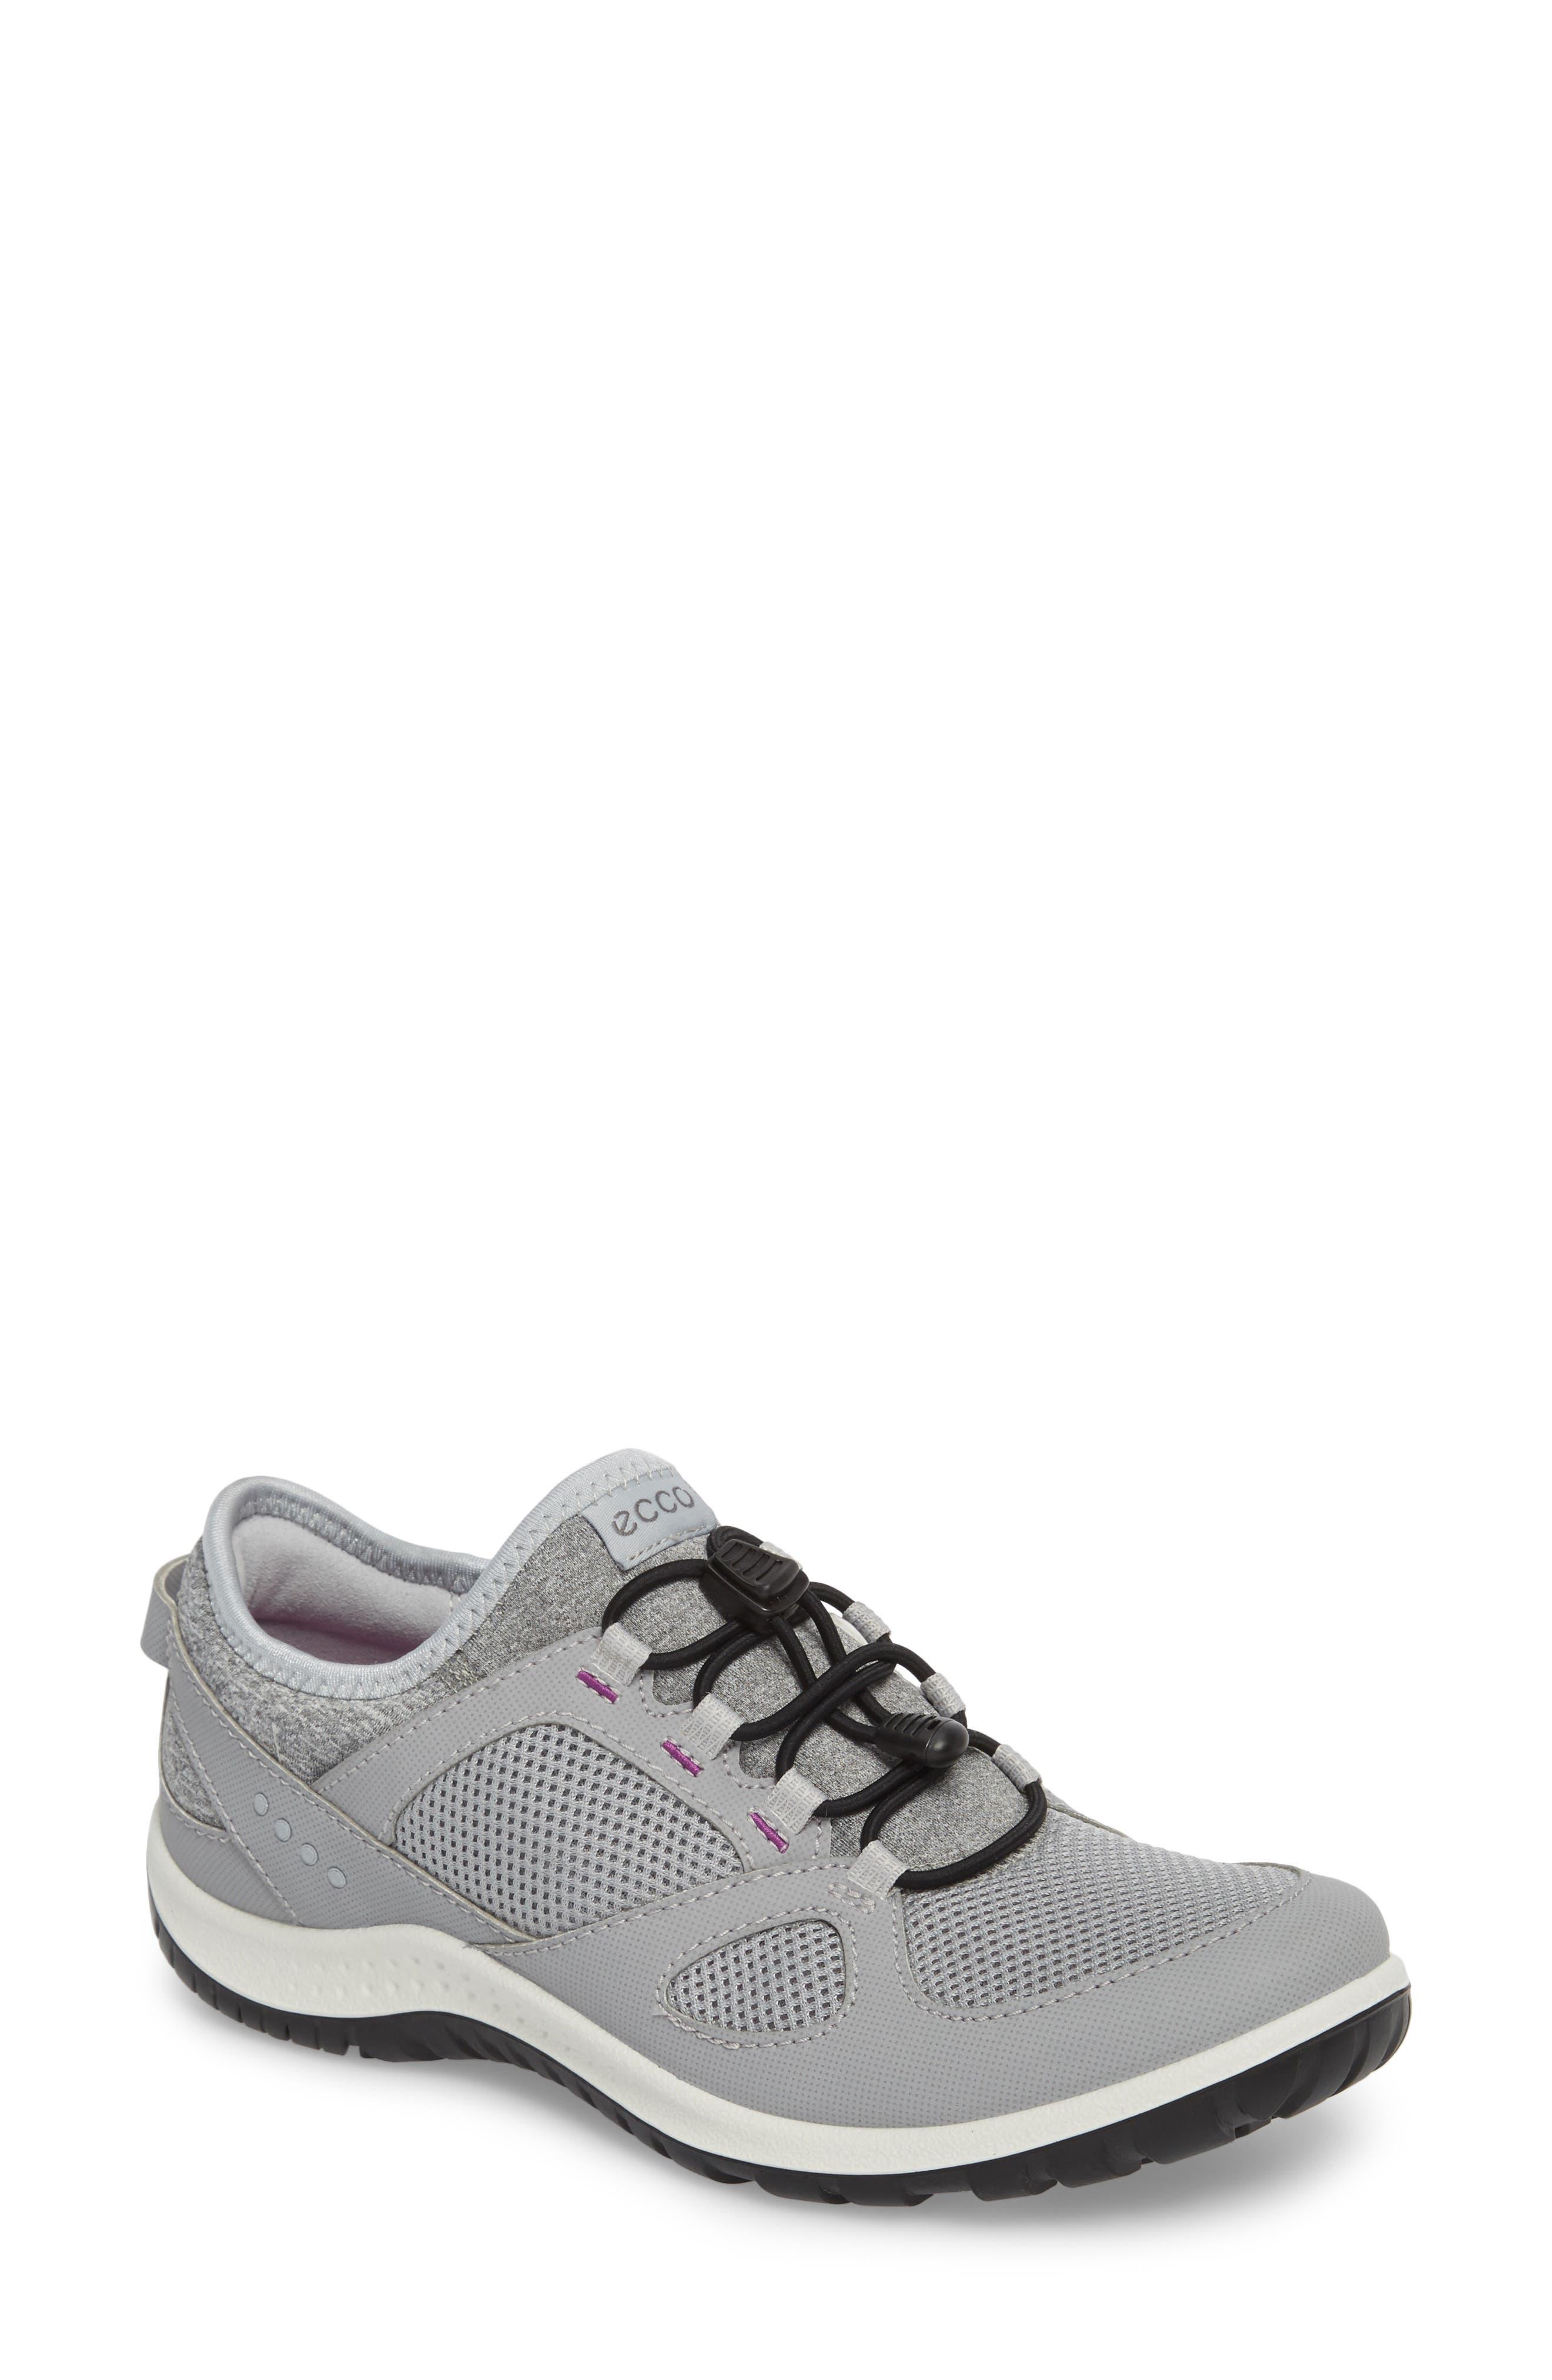 Aspina Toggle Hiking Sneaker,                             Main thumbnail 1, color,                             Silver Grey Leather